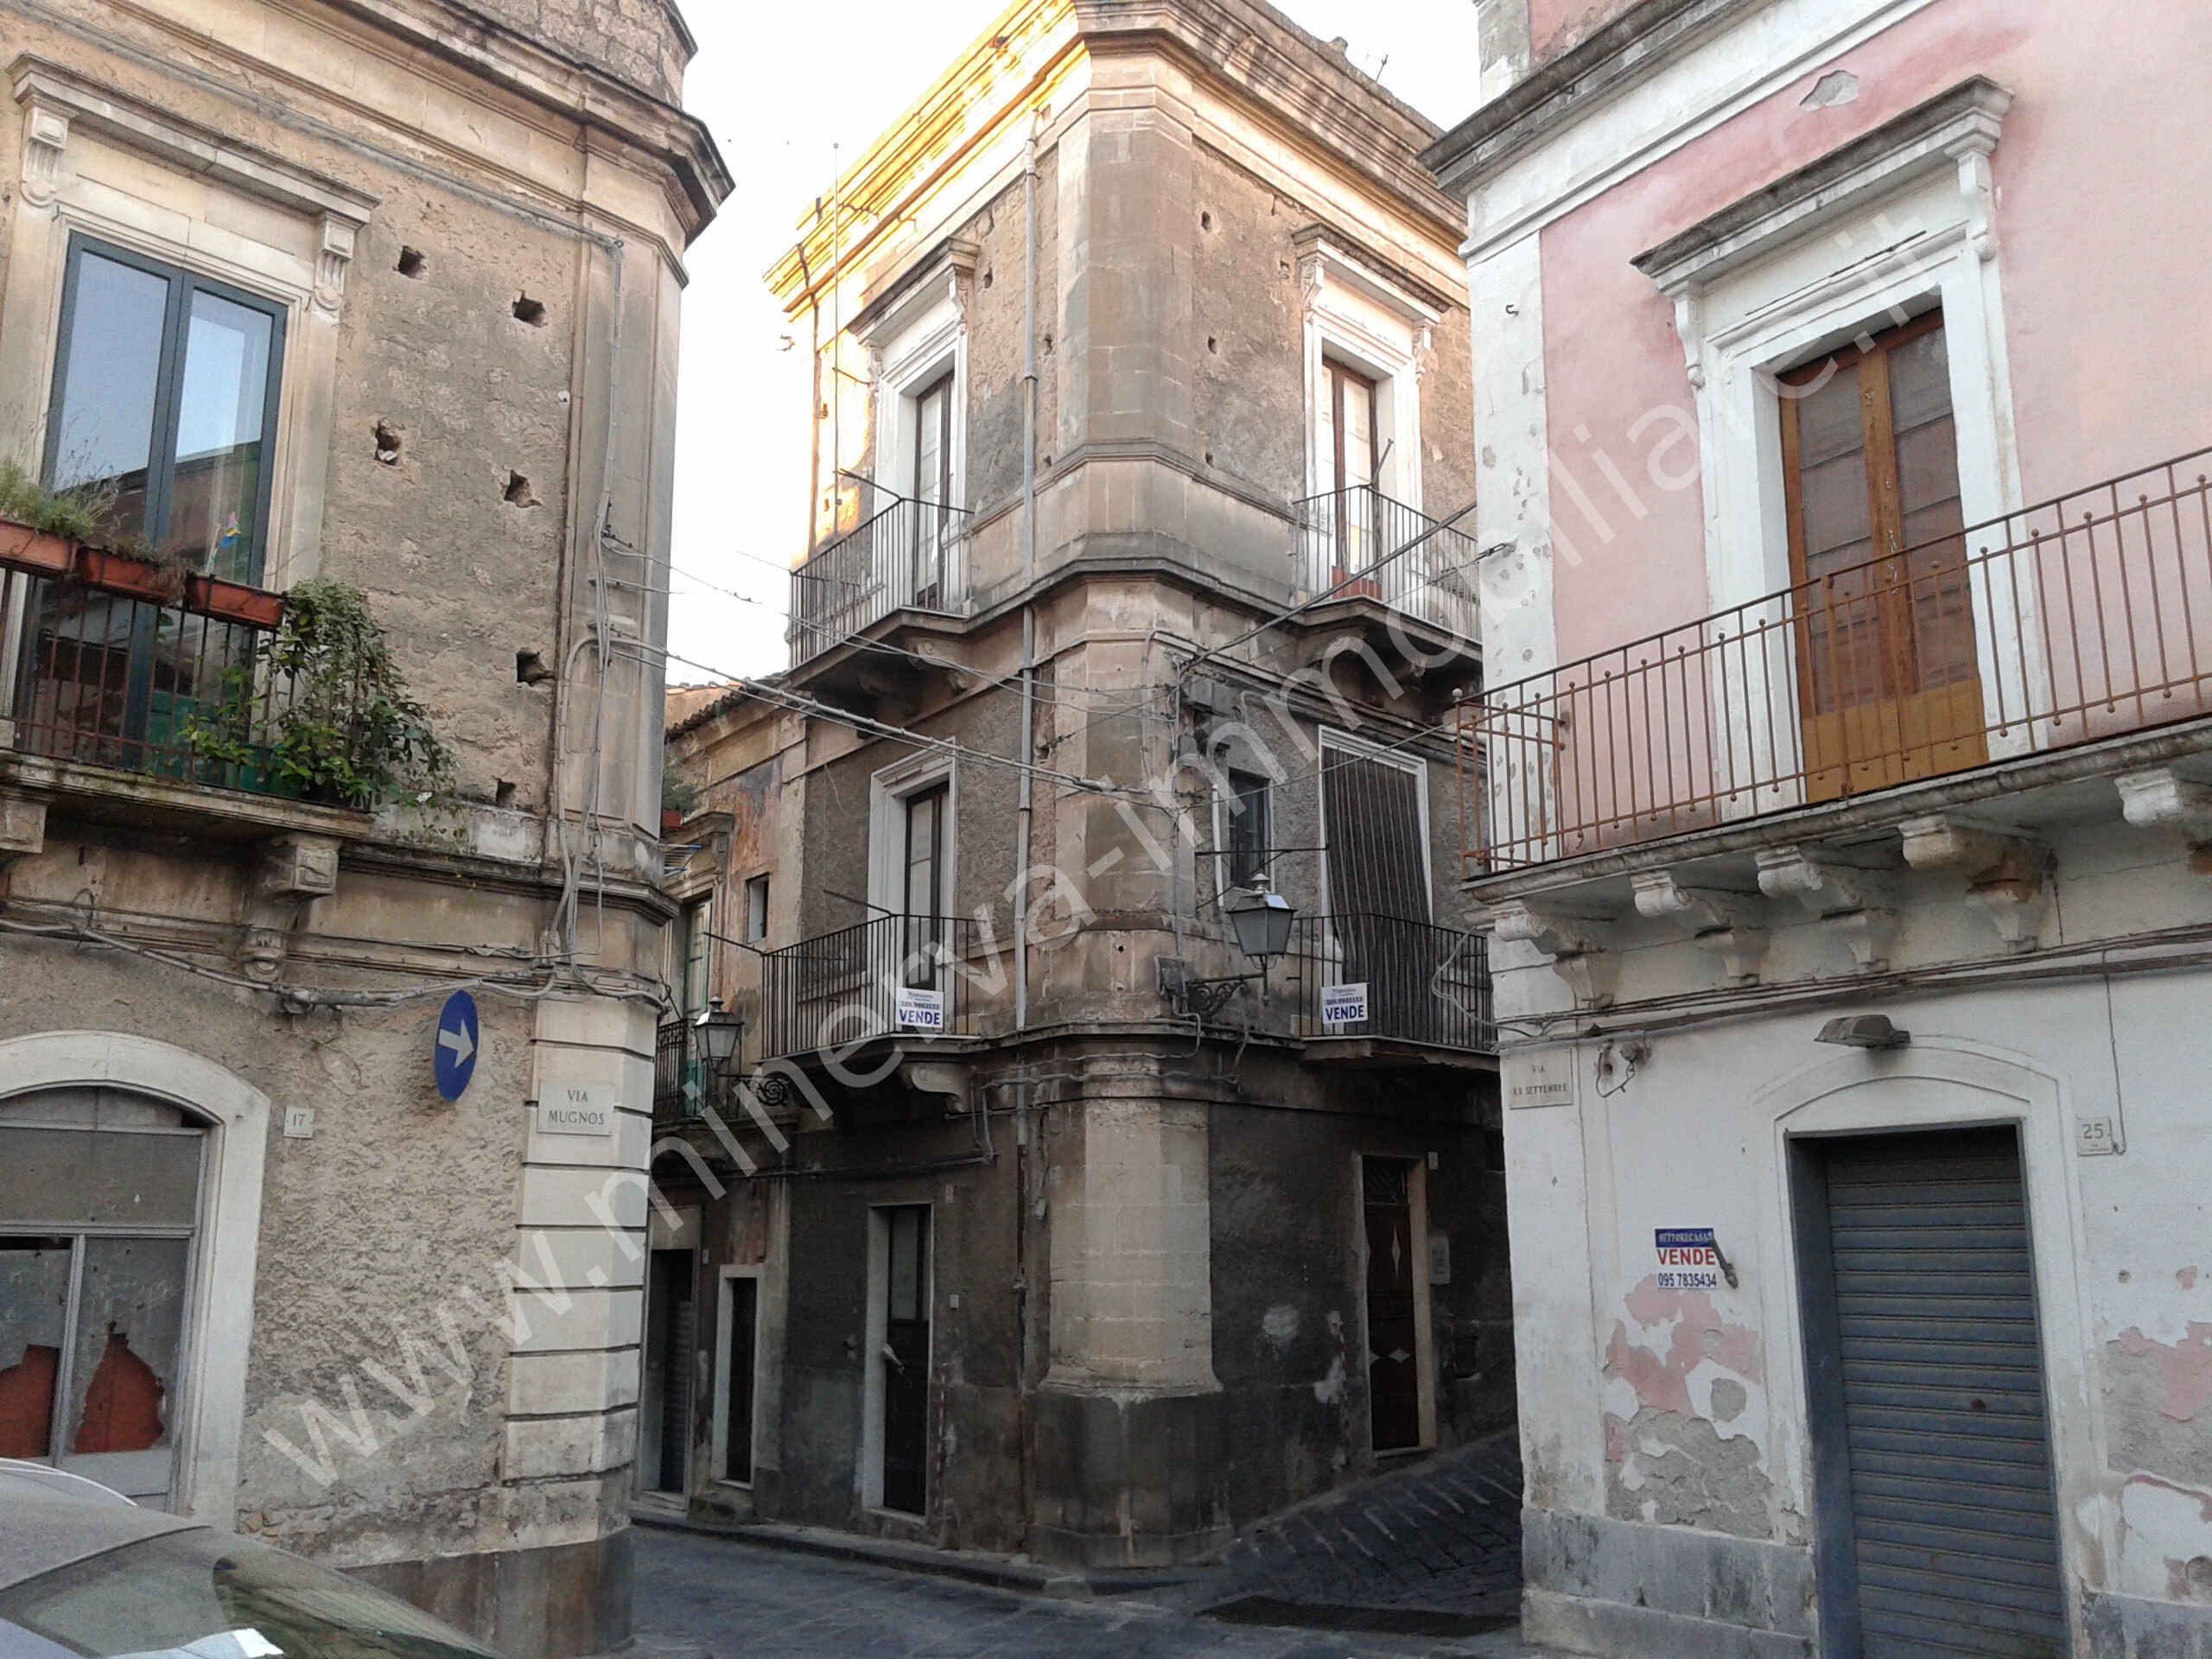 Vendita casa indipendente a Lentini